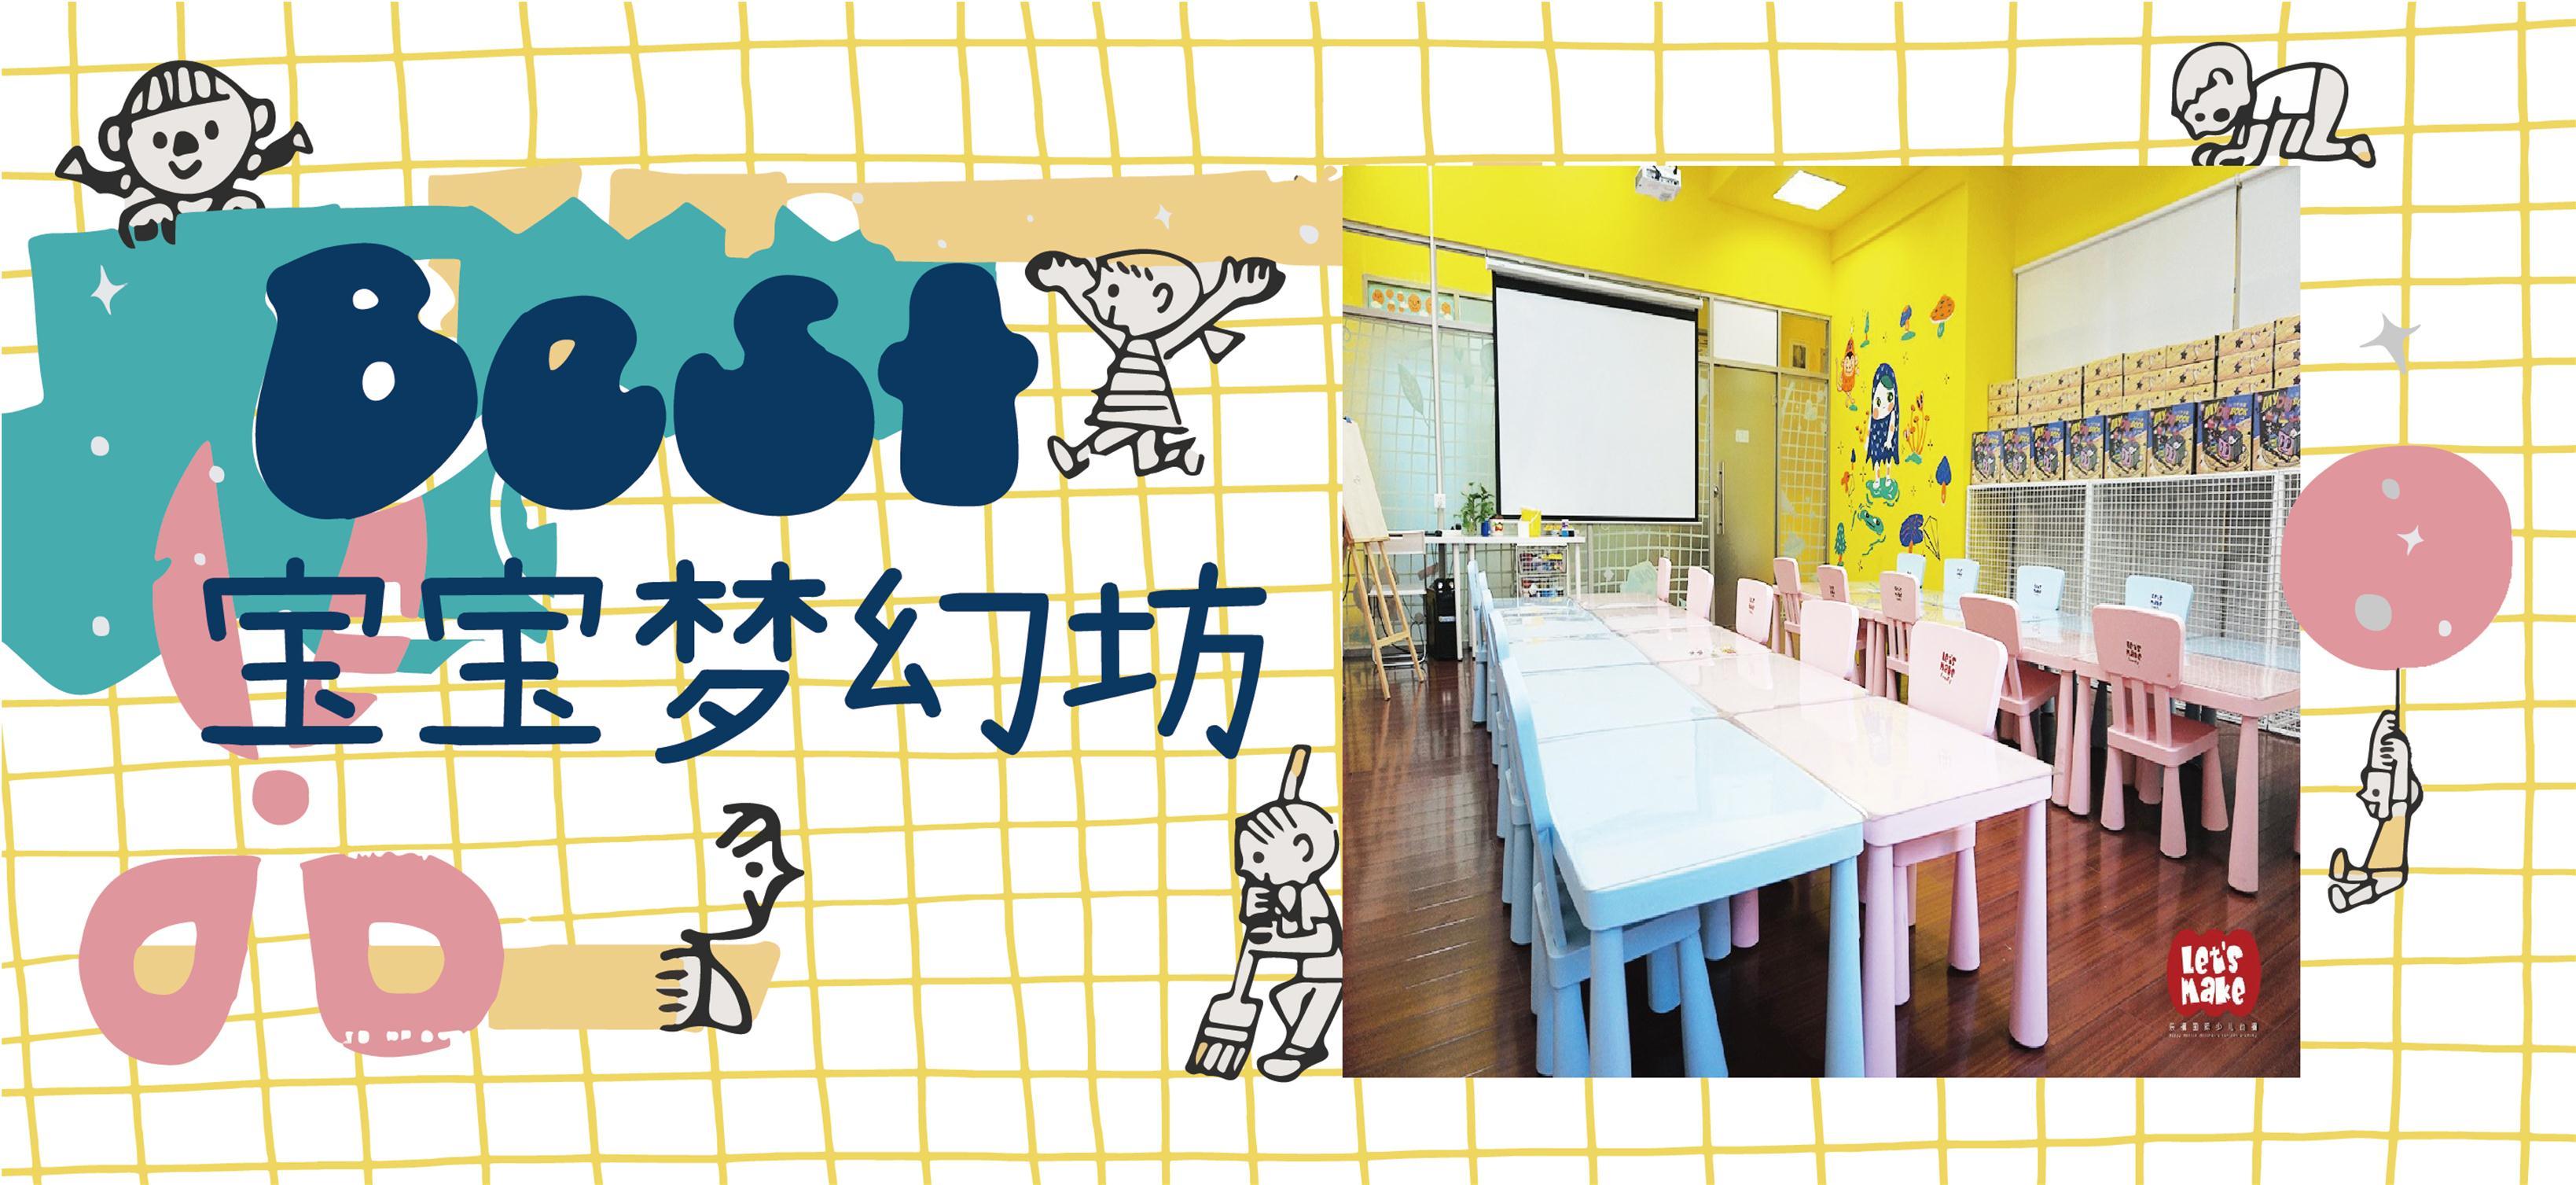 BEST寶寶夢幻坊(3.5-7歲)